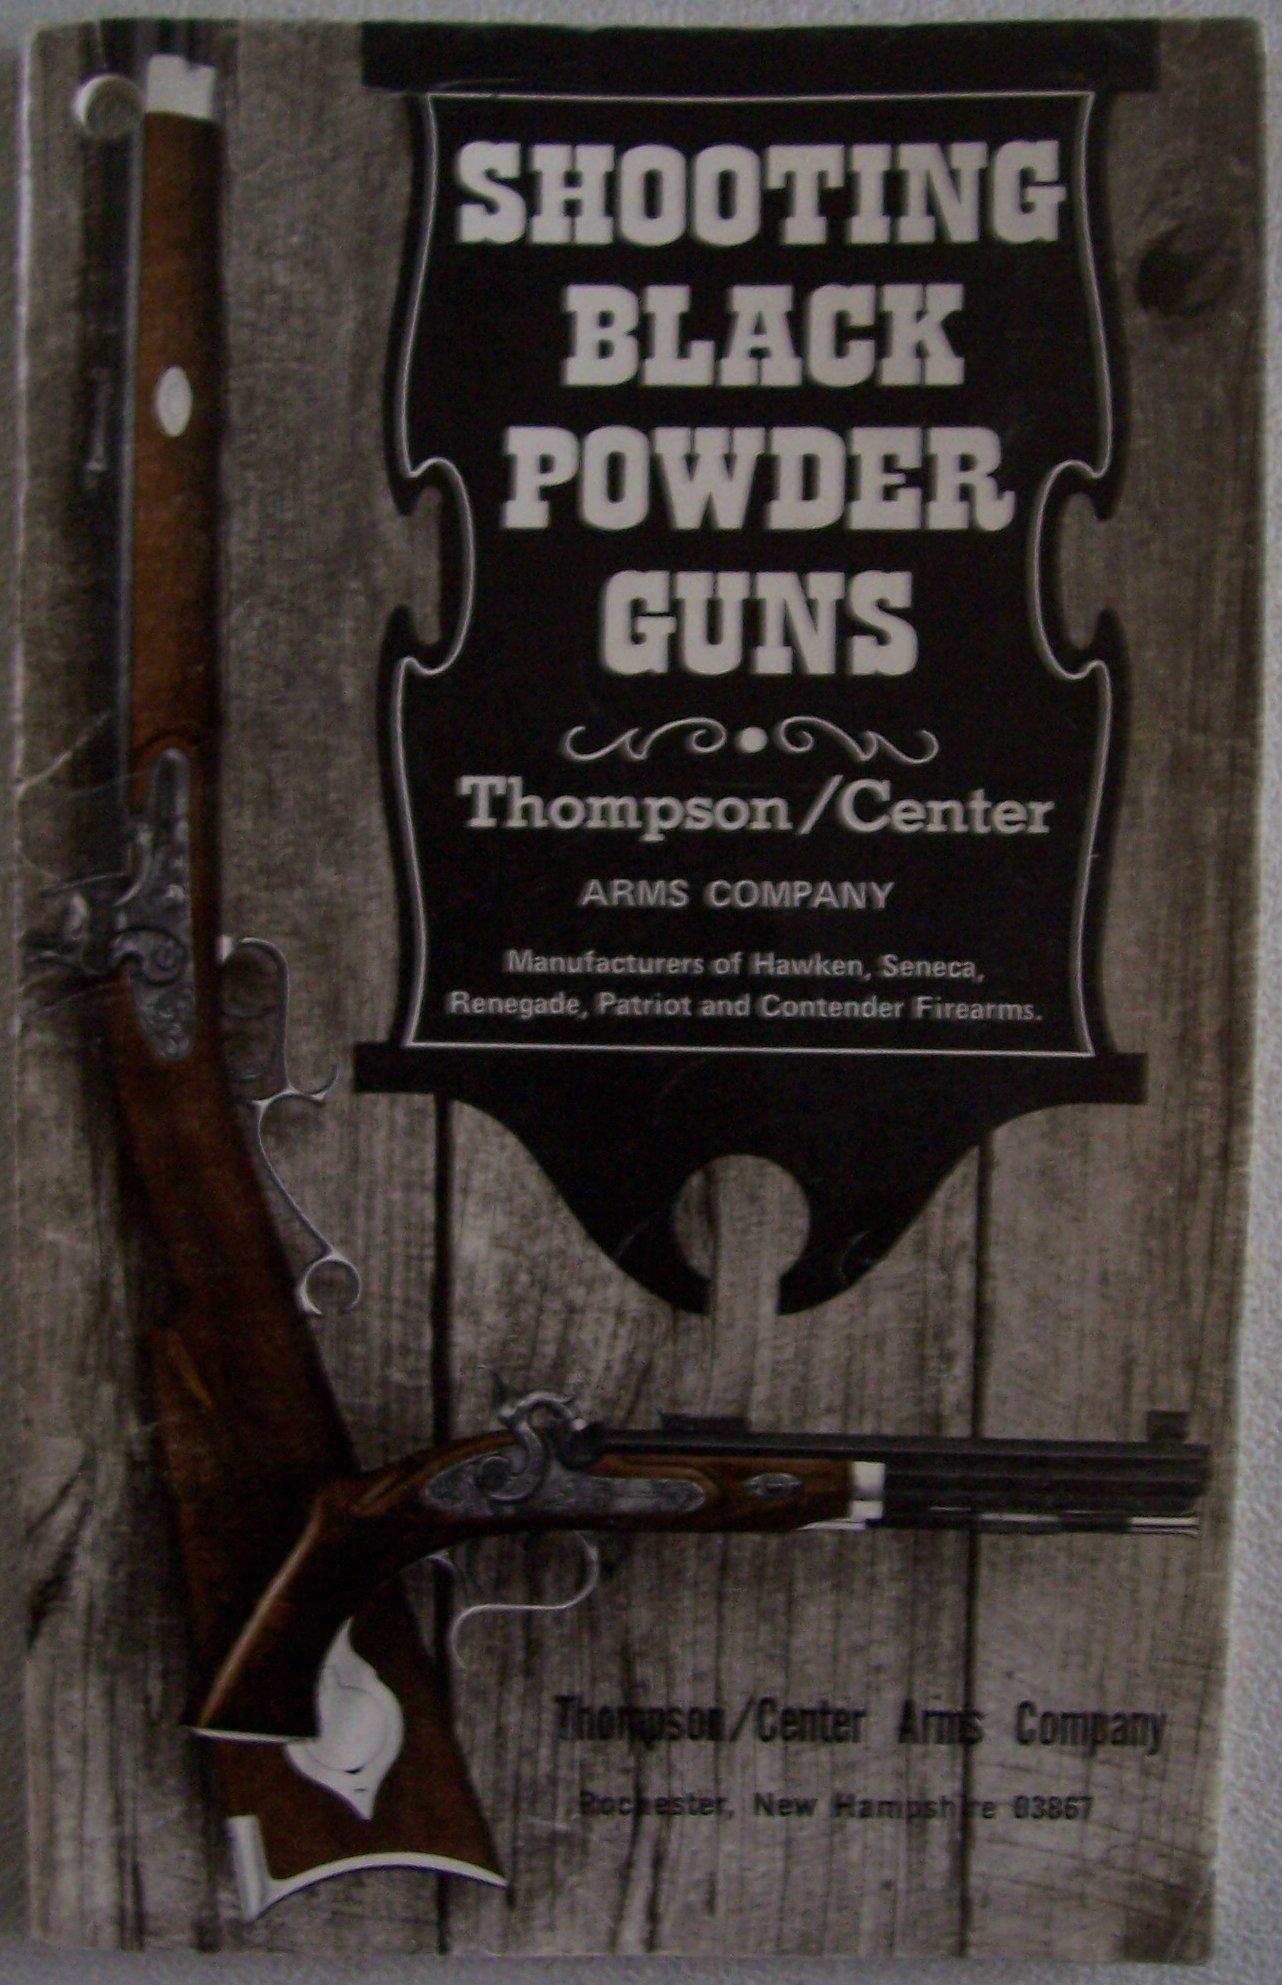 Shooting Black Powder Guns: Thompson/Center Arms Company